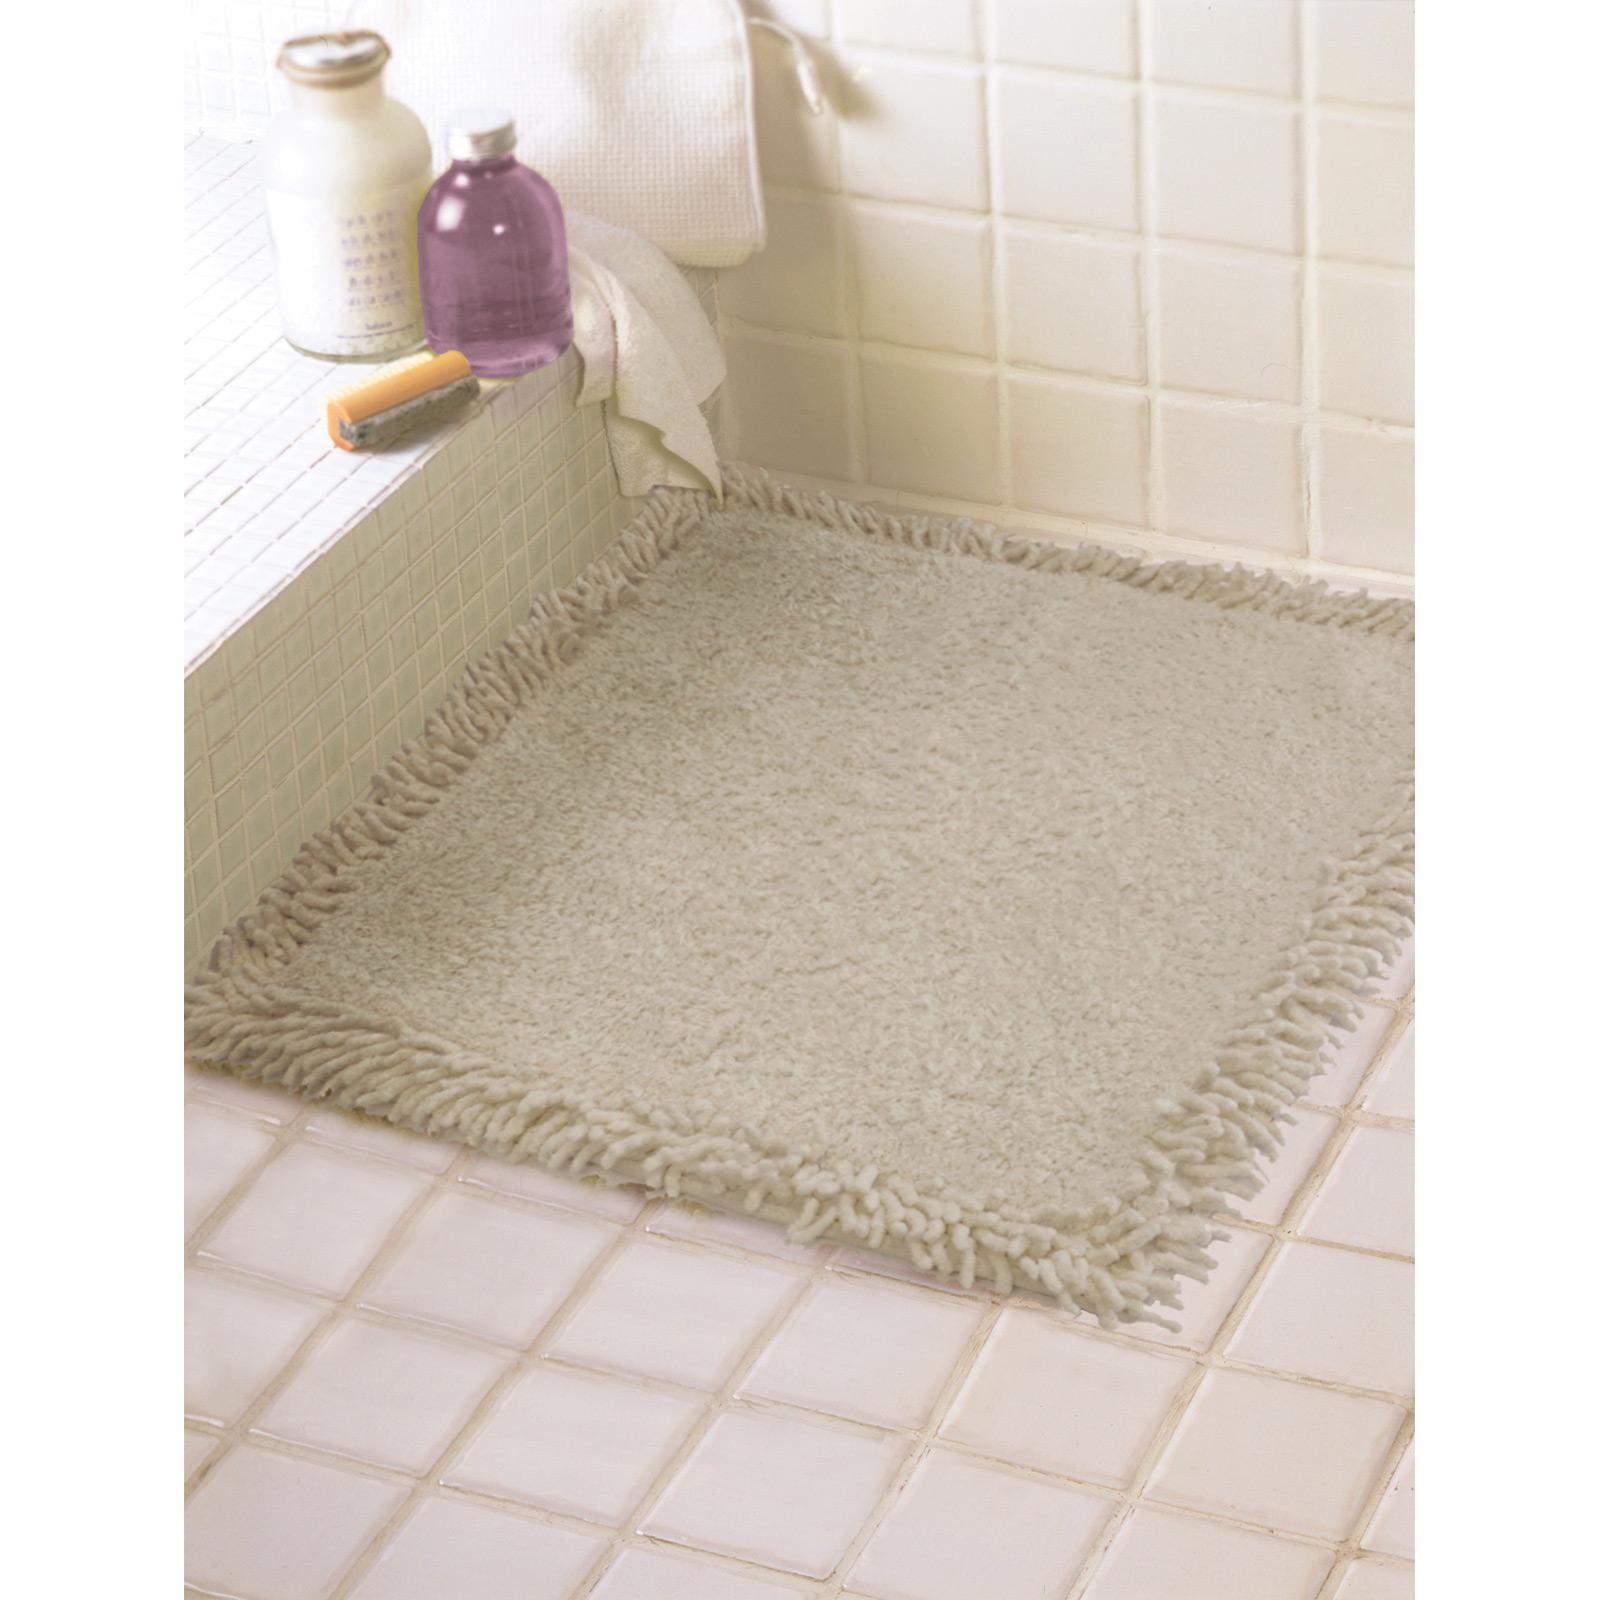 60cm x 60cm Shower Mat Floor Towel Bath Rug 100% Cotton Plum Aqua